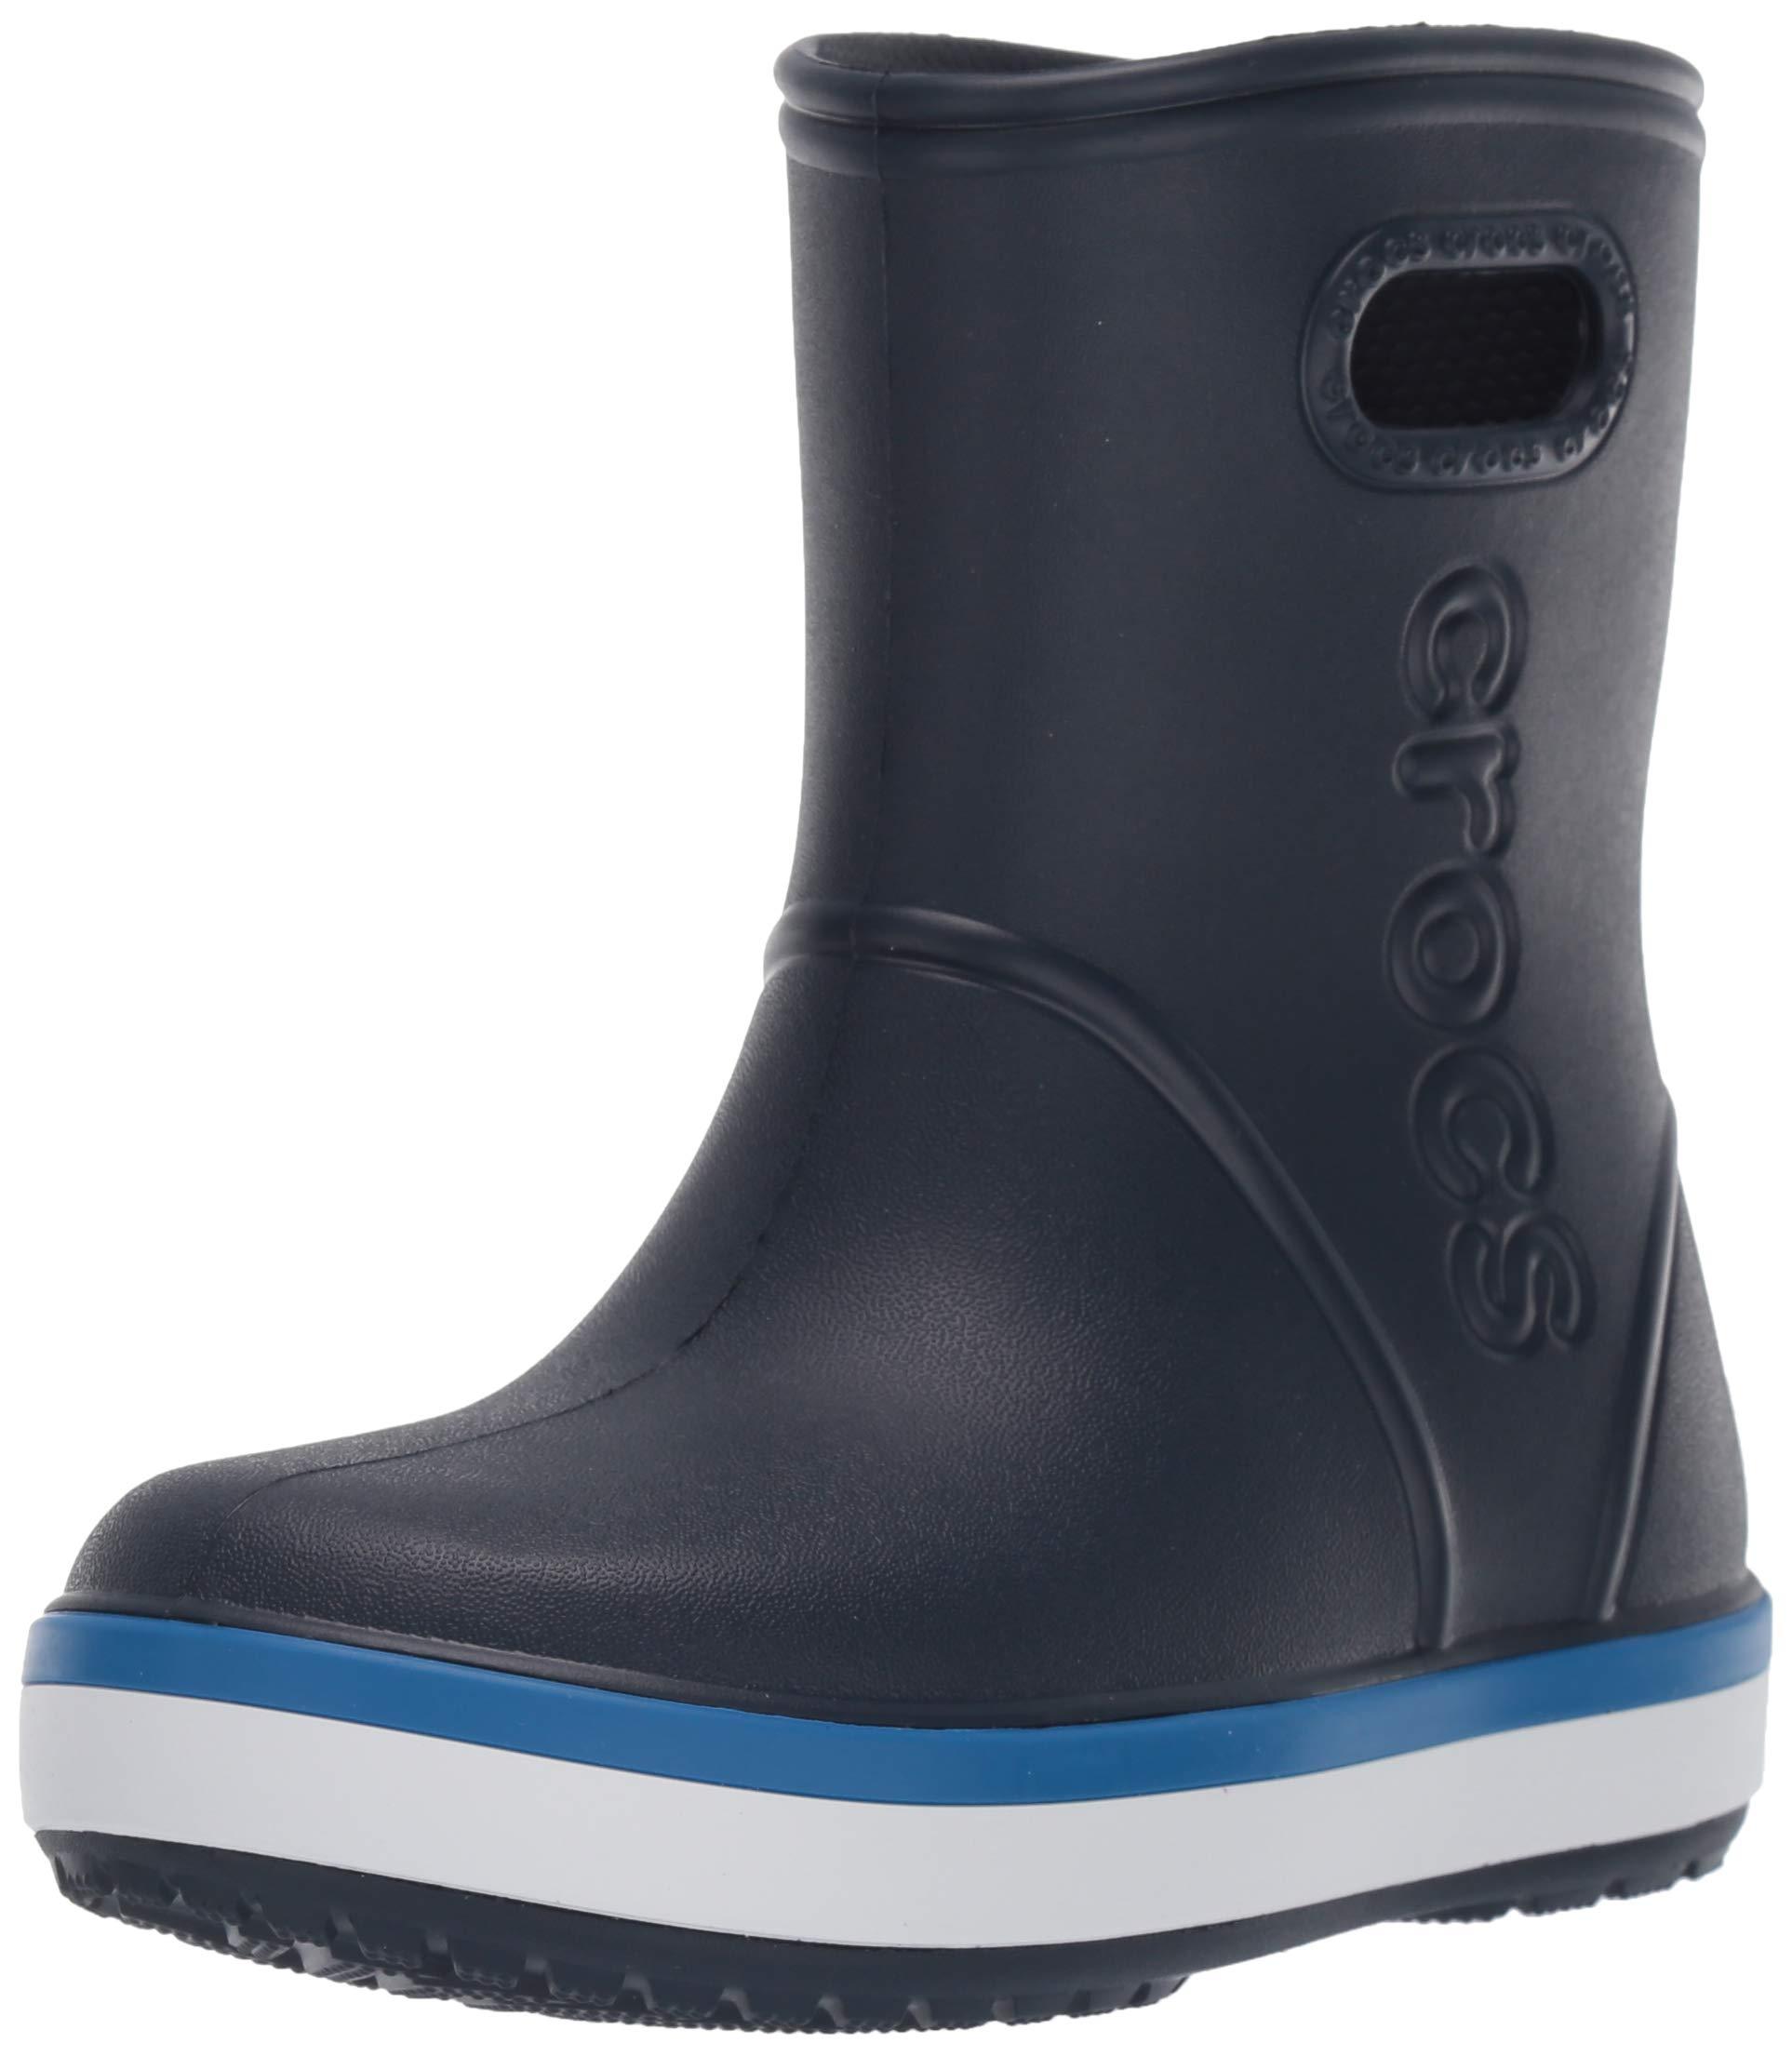 Crocs Unisex Crocband Rain Boot, Navy/Bright Cobalt, 2 M US Little Kid